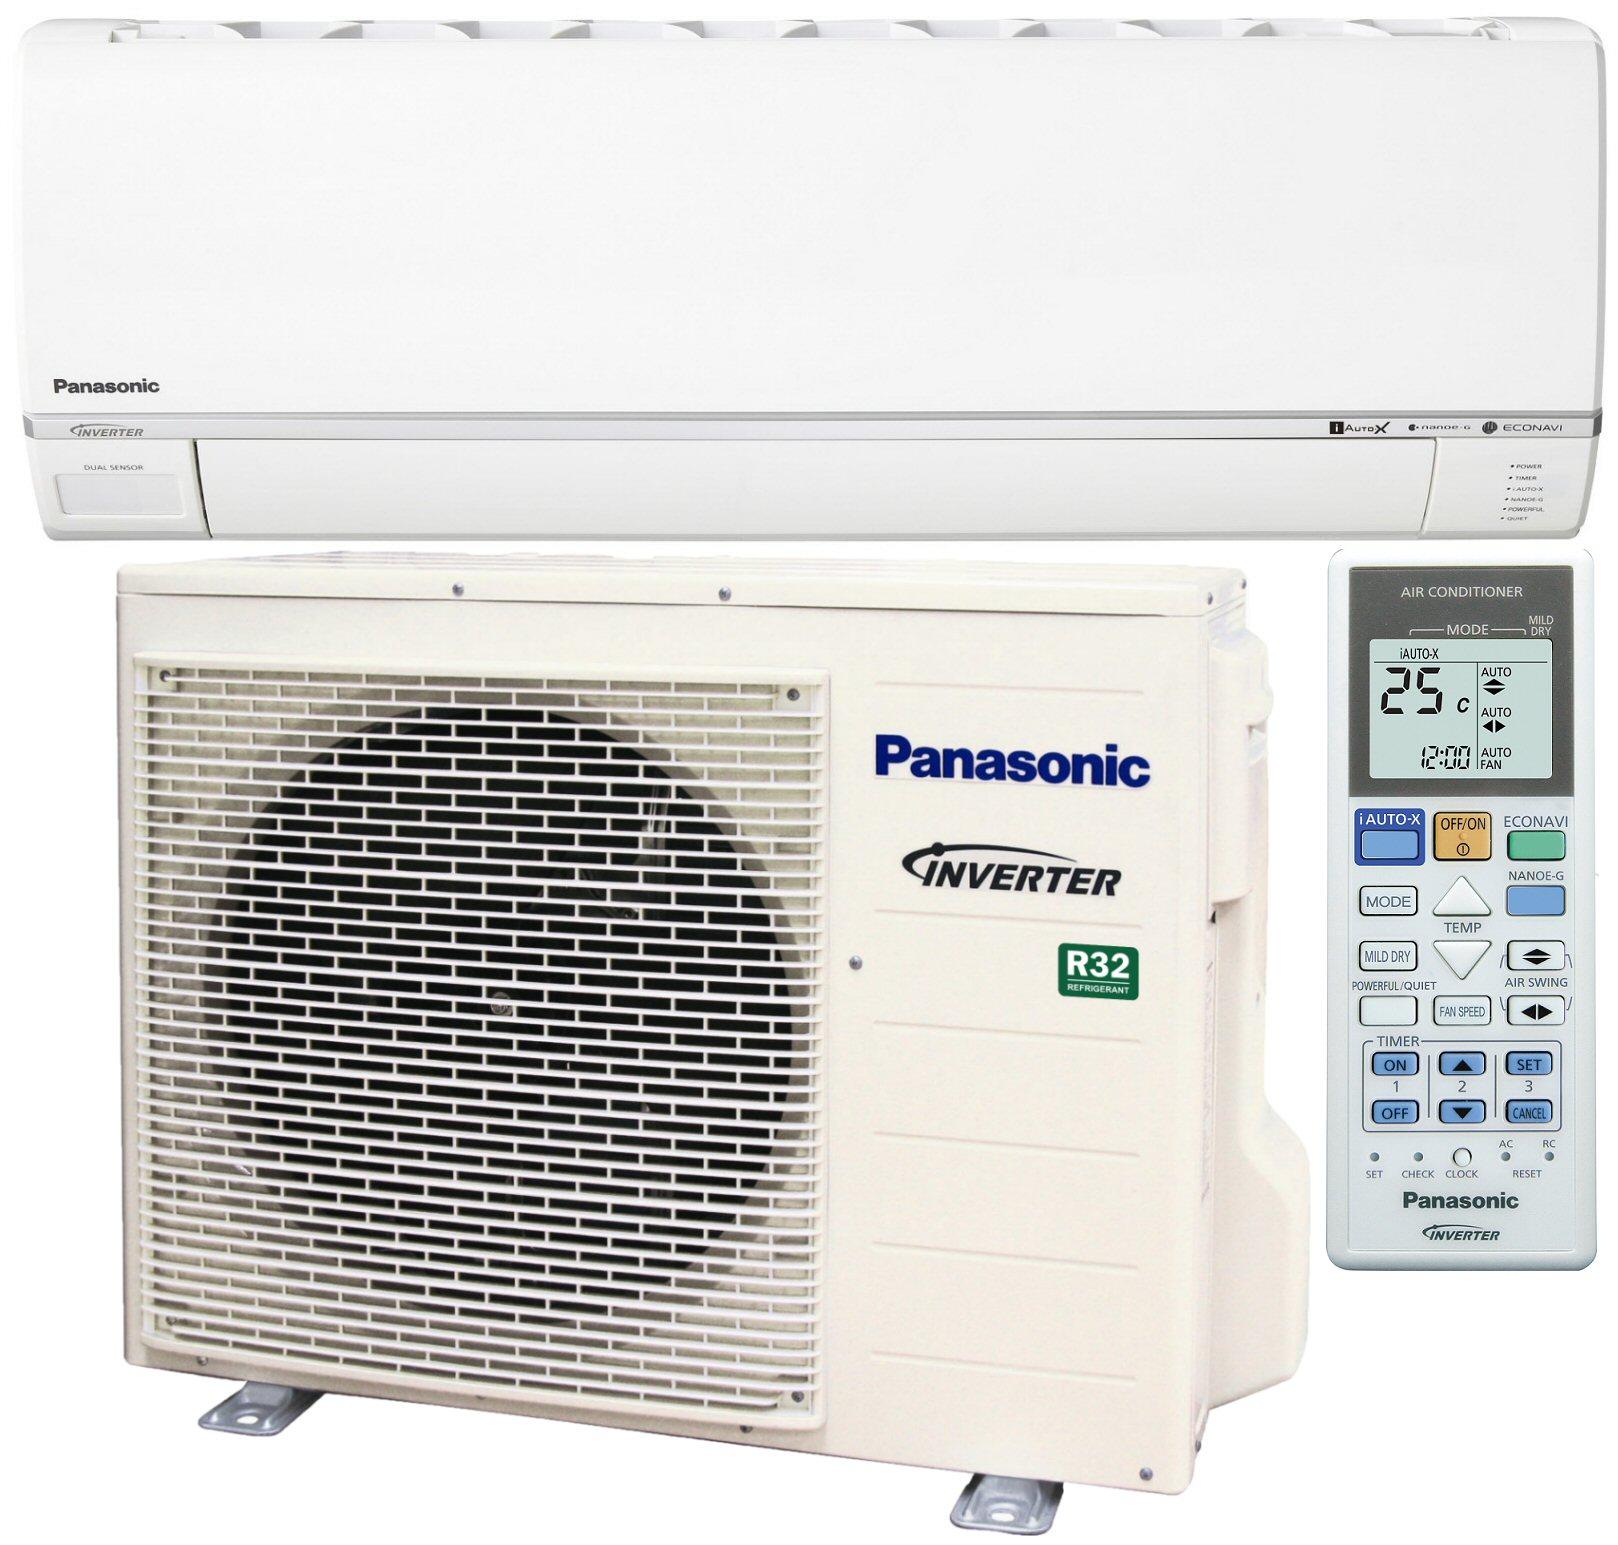 Panasonic Heat Pumps - Air Conditioners — Yunca Group